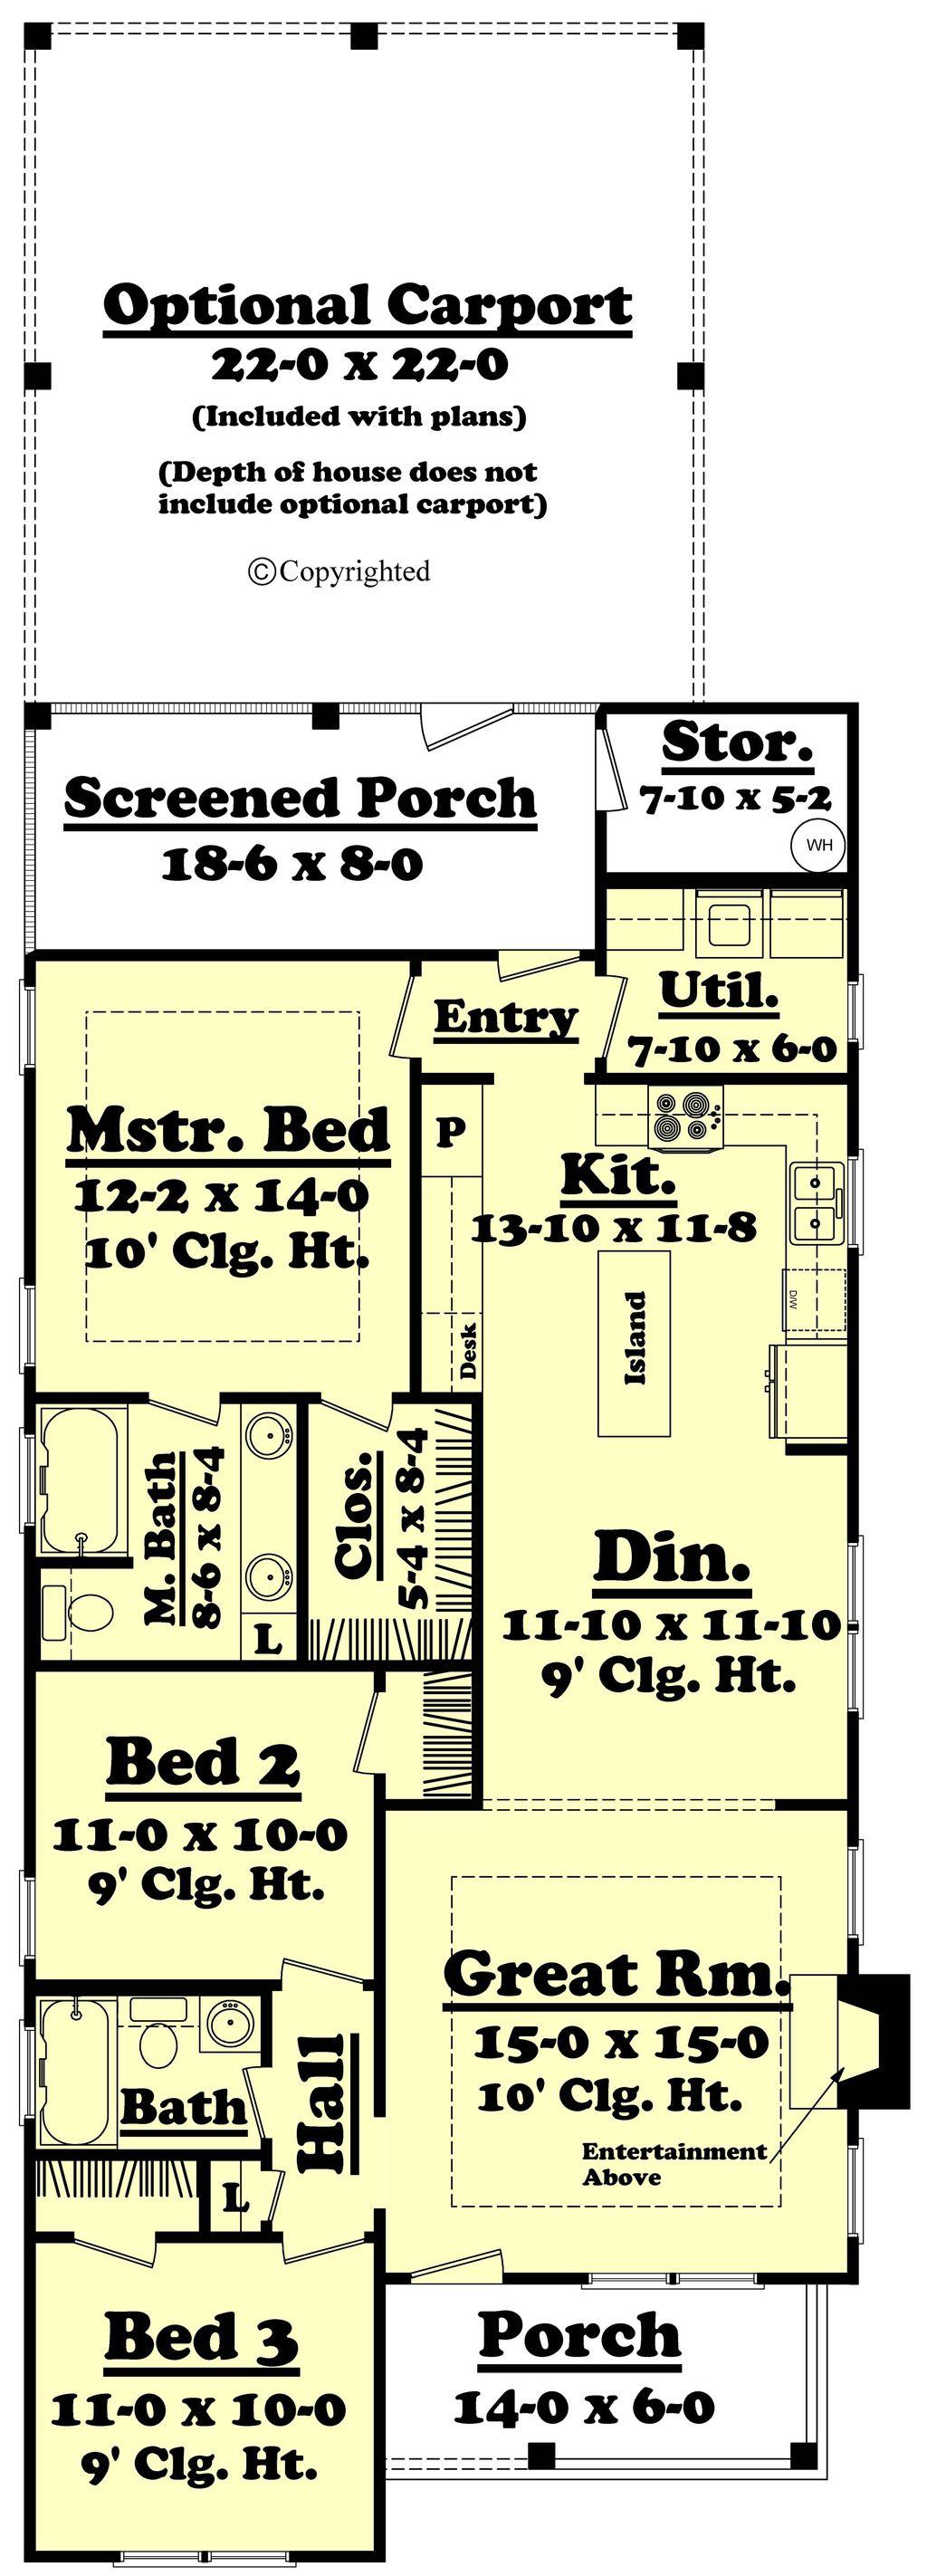 cottage style house plan 3 beds 2 baths 1300 sq ft plan 430 40 rh pinterest com